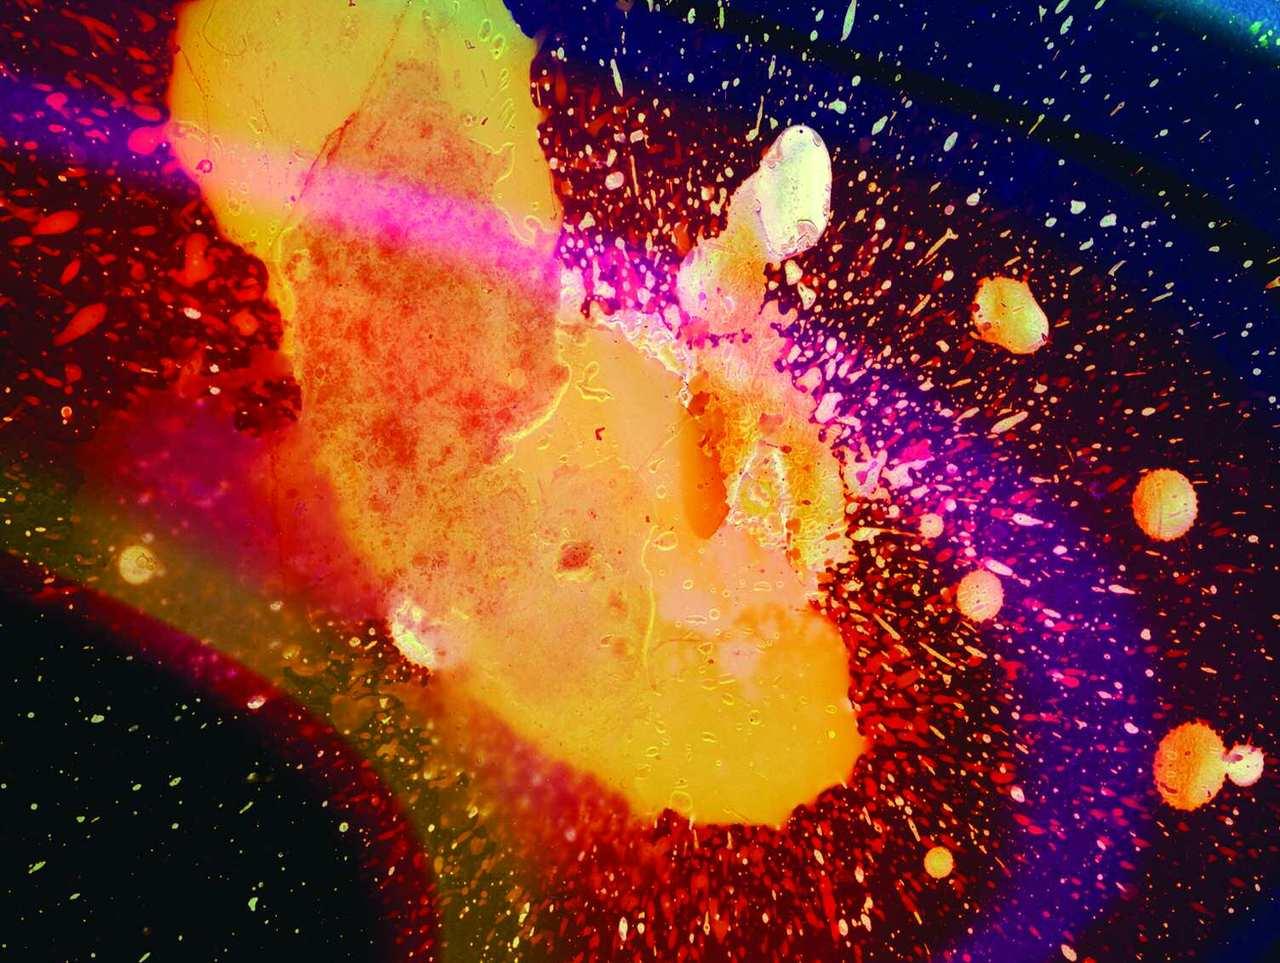 78 Best images about RadioHeaD ArtWork on Pinterest | Artworks